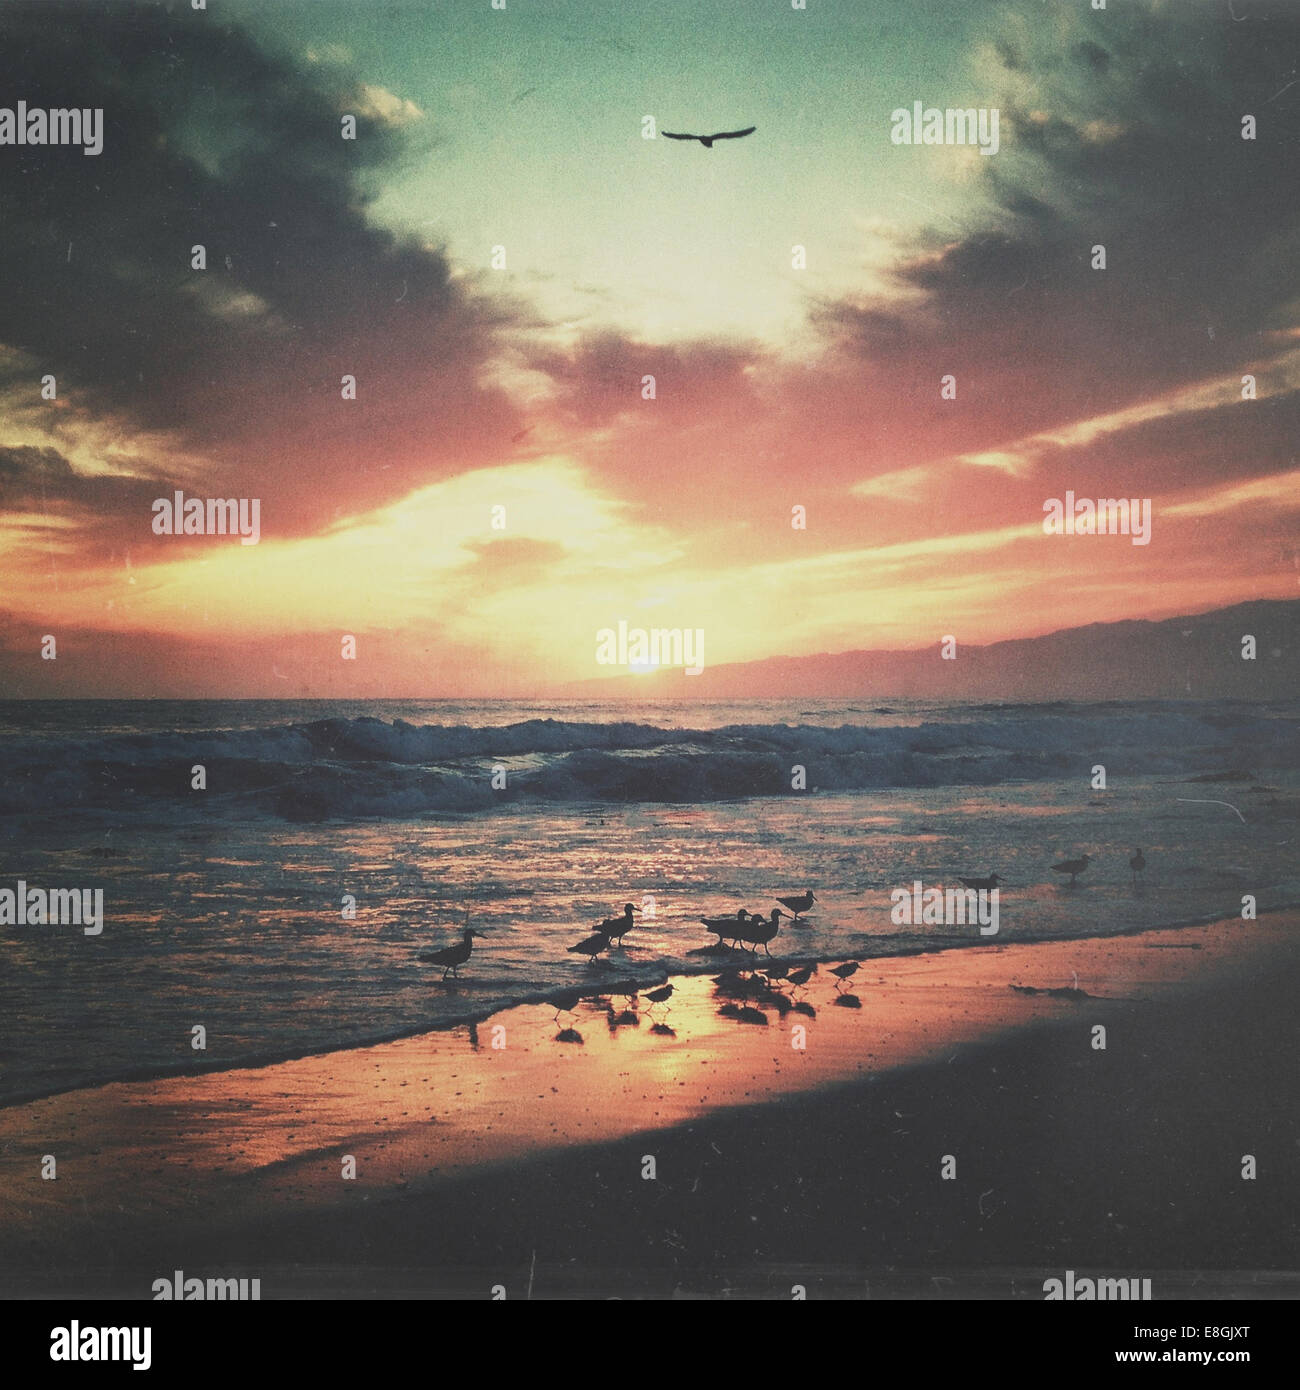 USA, California, Los Angeles County, Sunset over Santa Monica - Stock Image